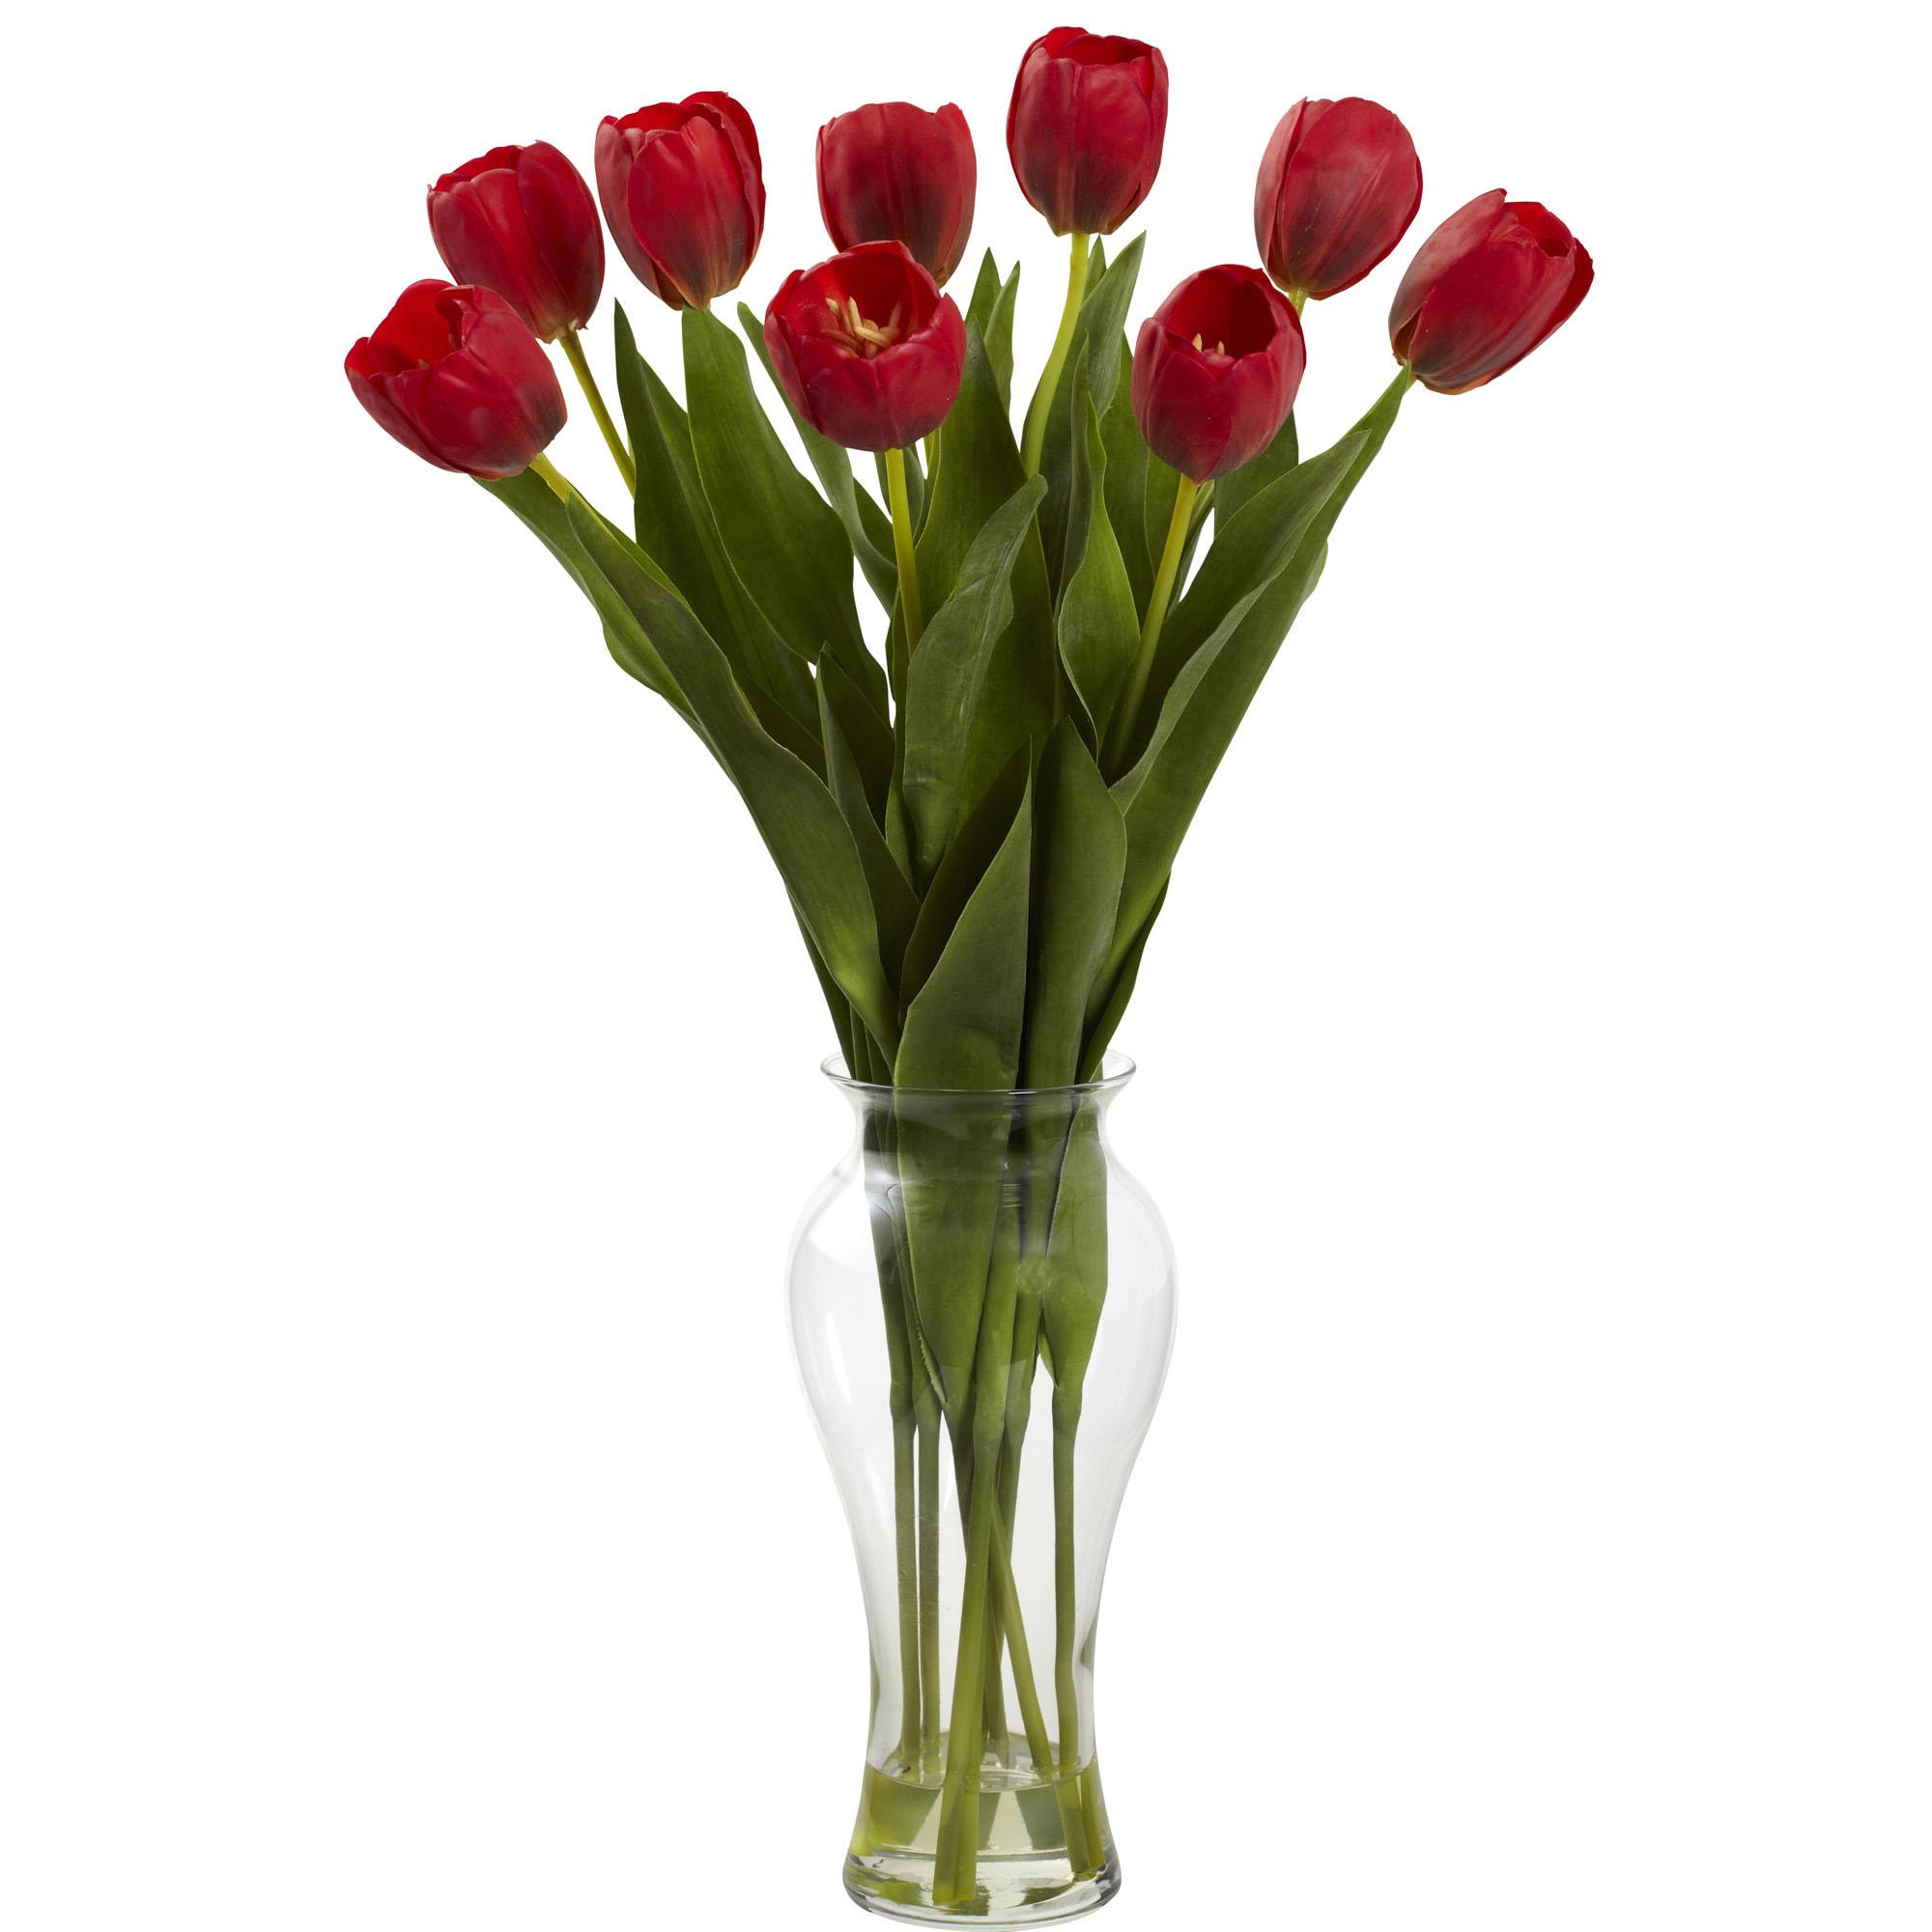 24 inch Red Indoor Silk Tulips in Decorative Glass Vase  1361RD